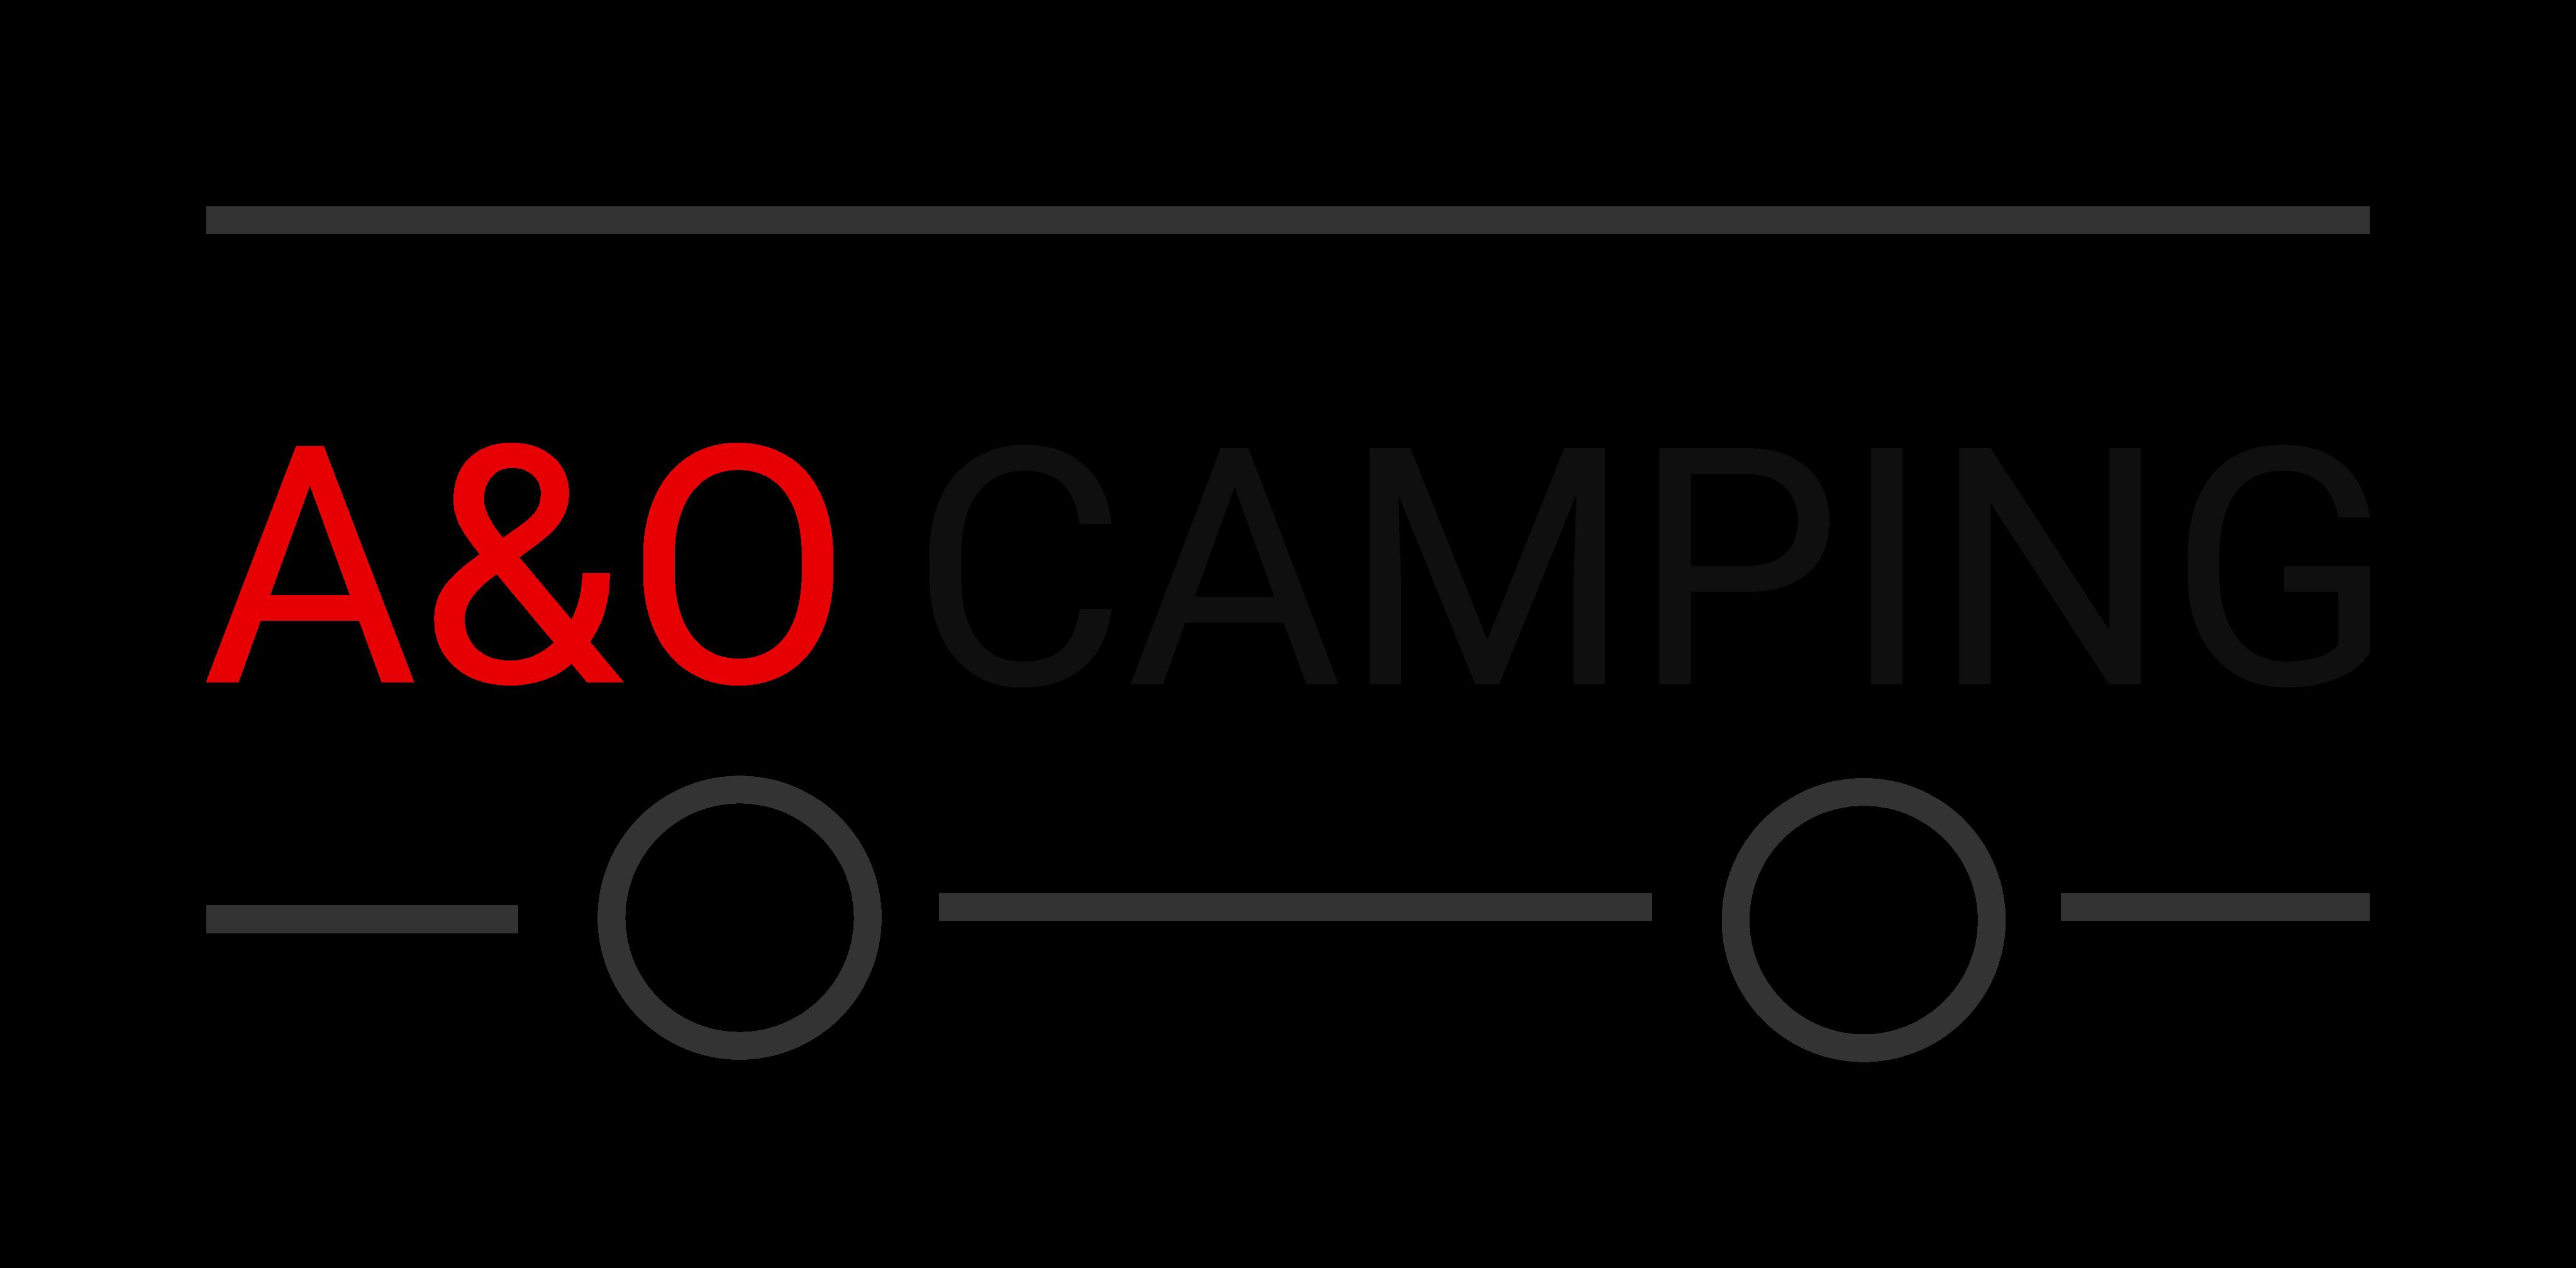 A&O Camping Logo